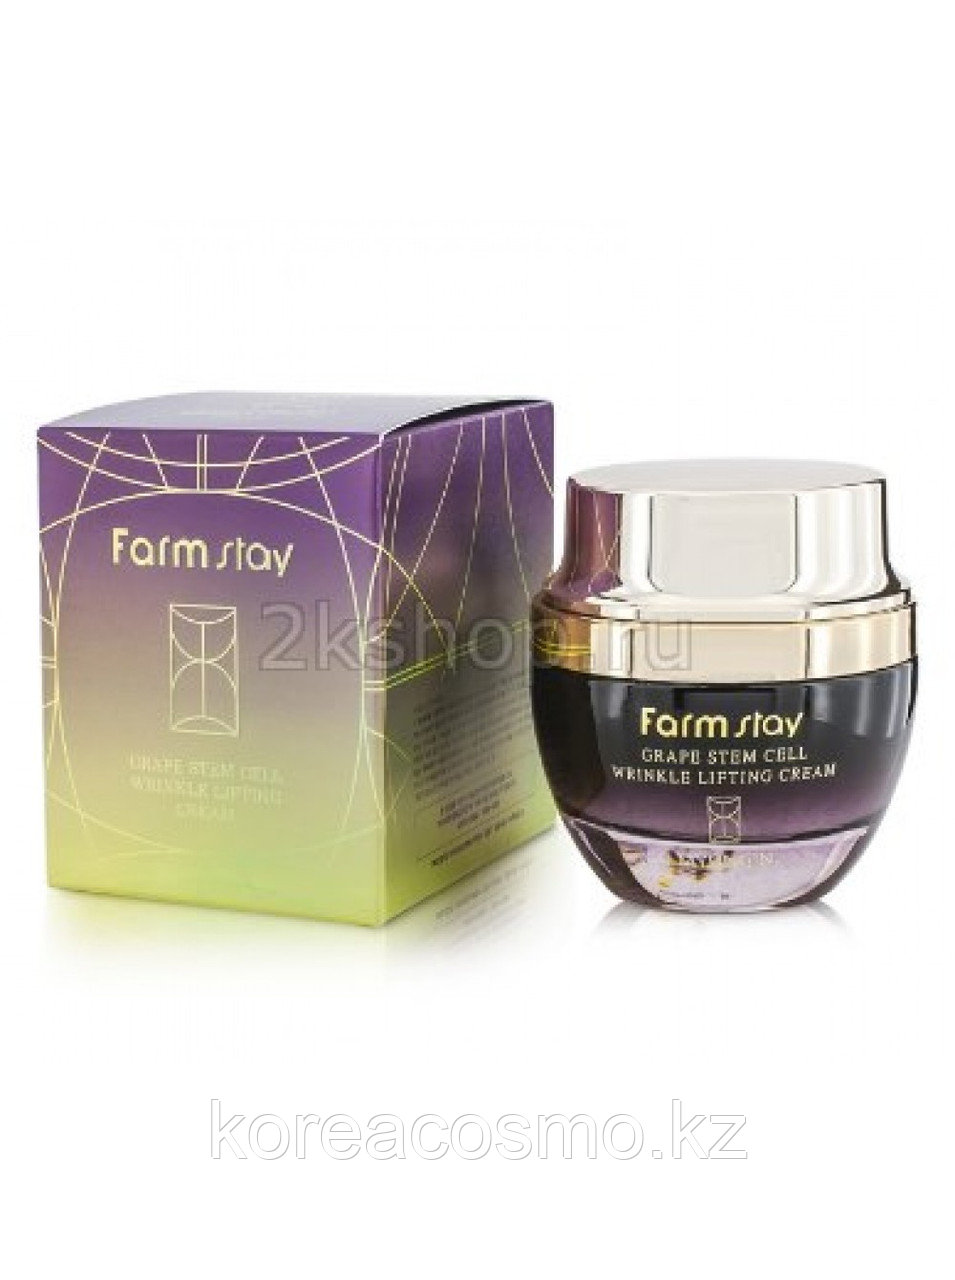 FarmStay Лифтинг-крем от морщин с фитостволовыми клетками винограда Grape Stem Cell Wrinkle Lifting Cream 50g